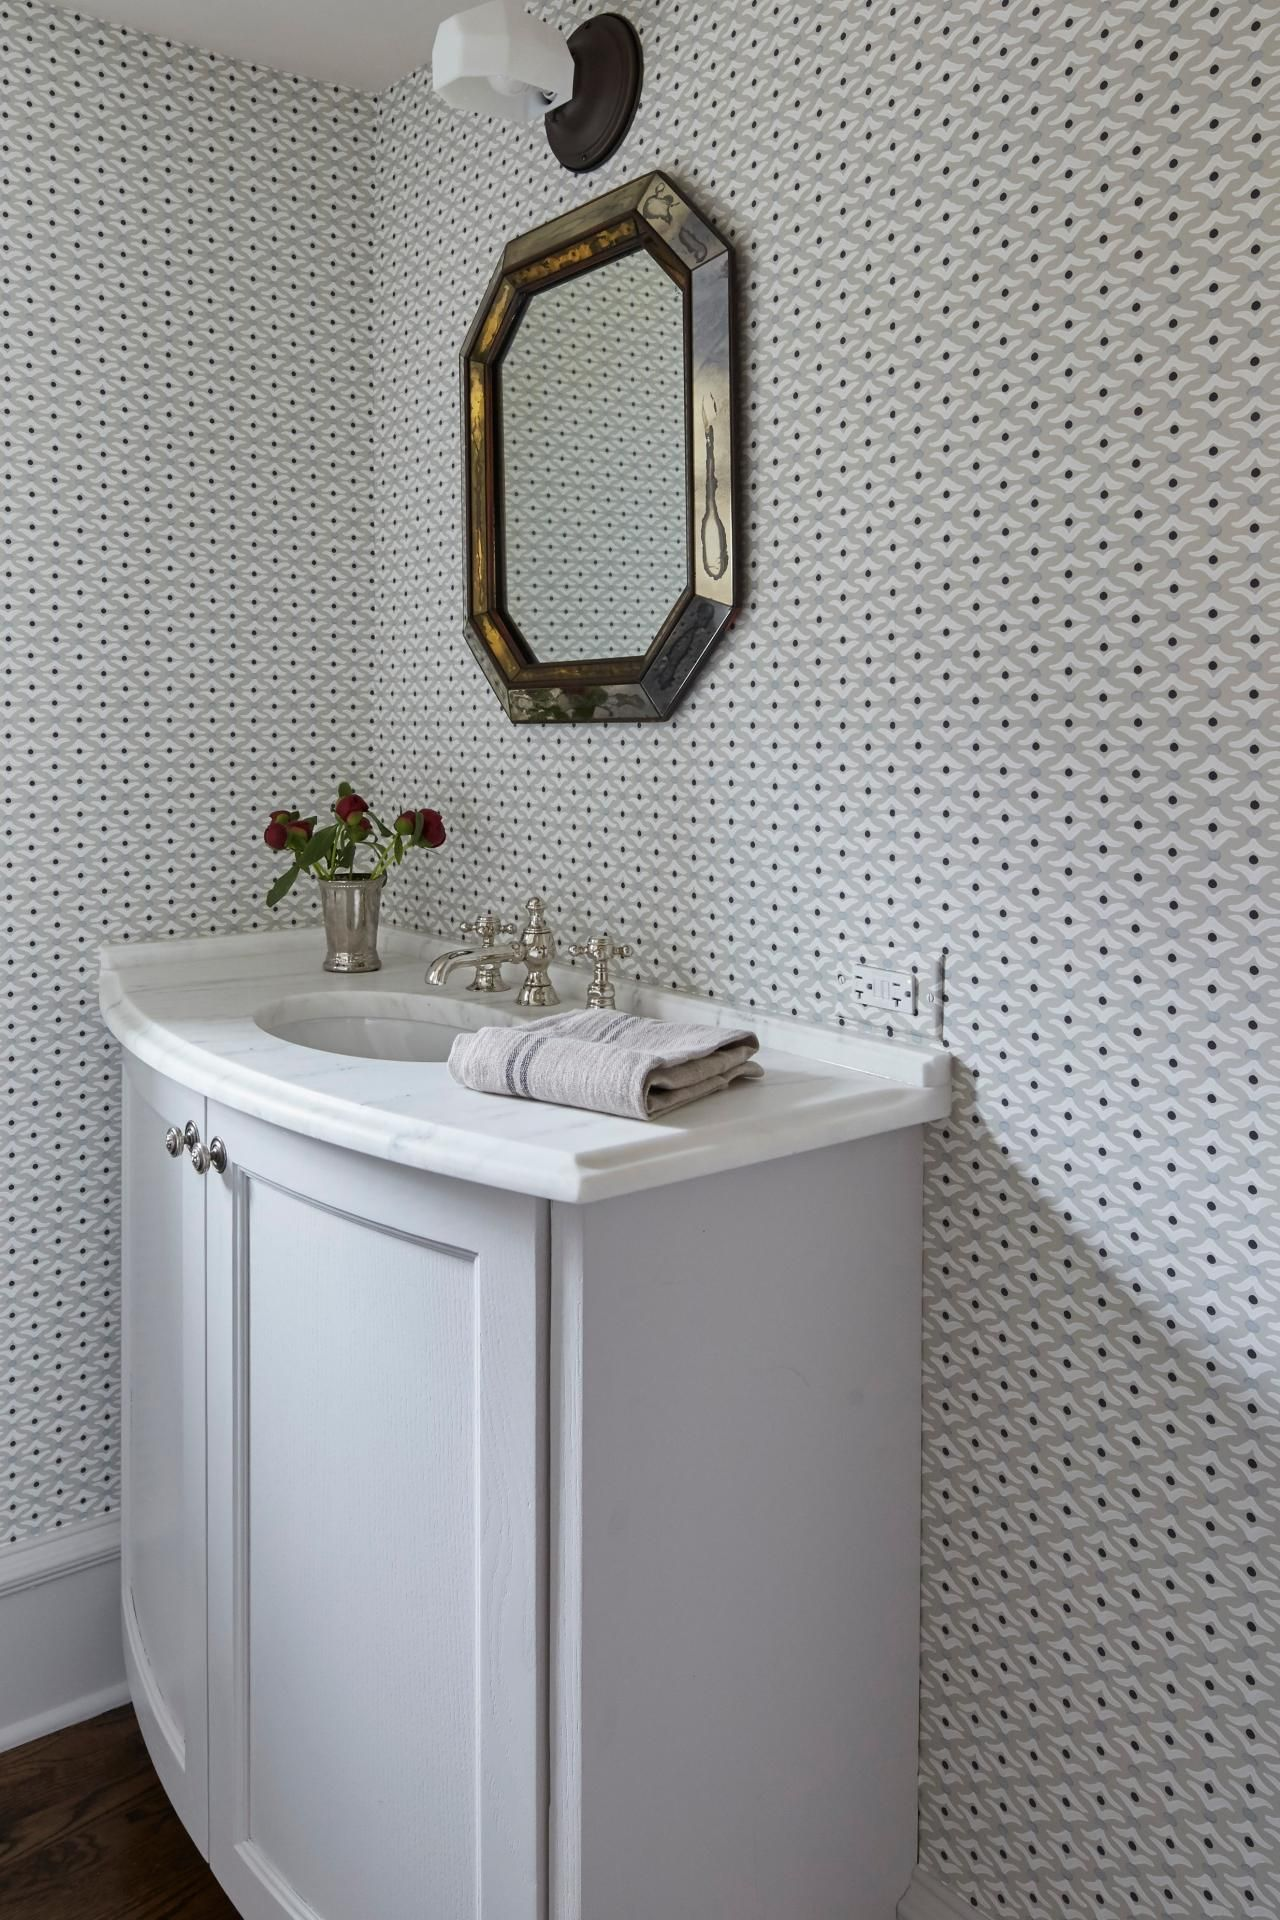 Bathroom Makeover Sweepstakes Bathroom Design - Bathroom remodel sweepstakes